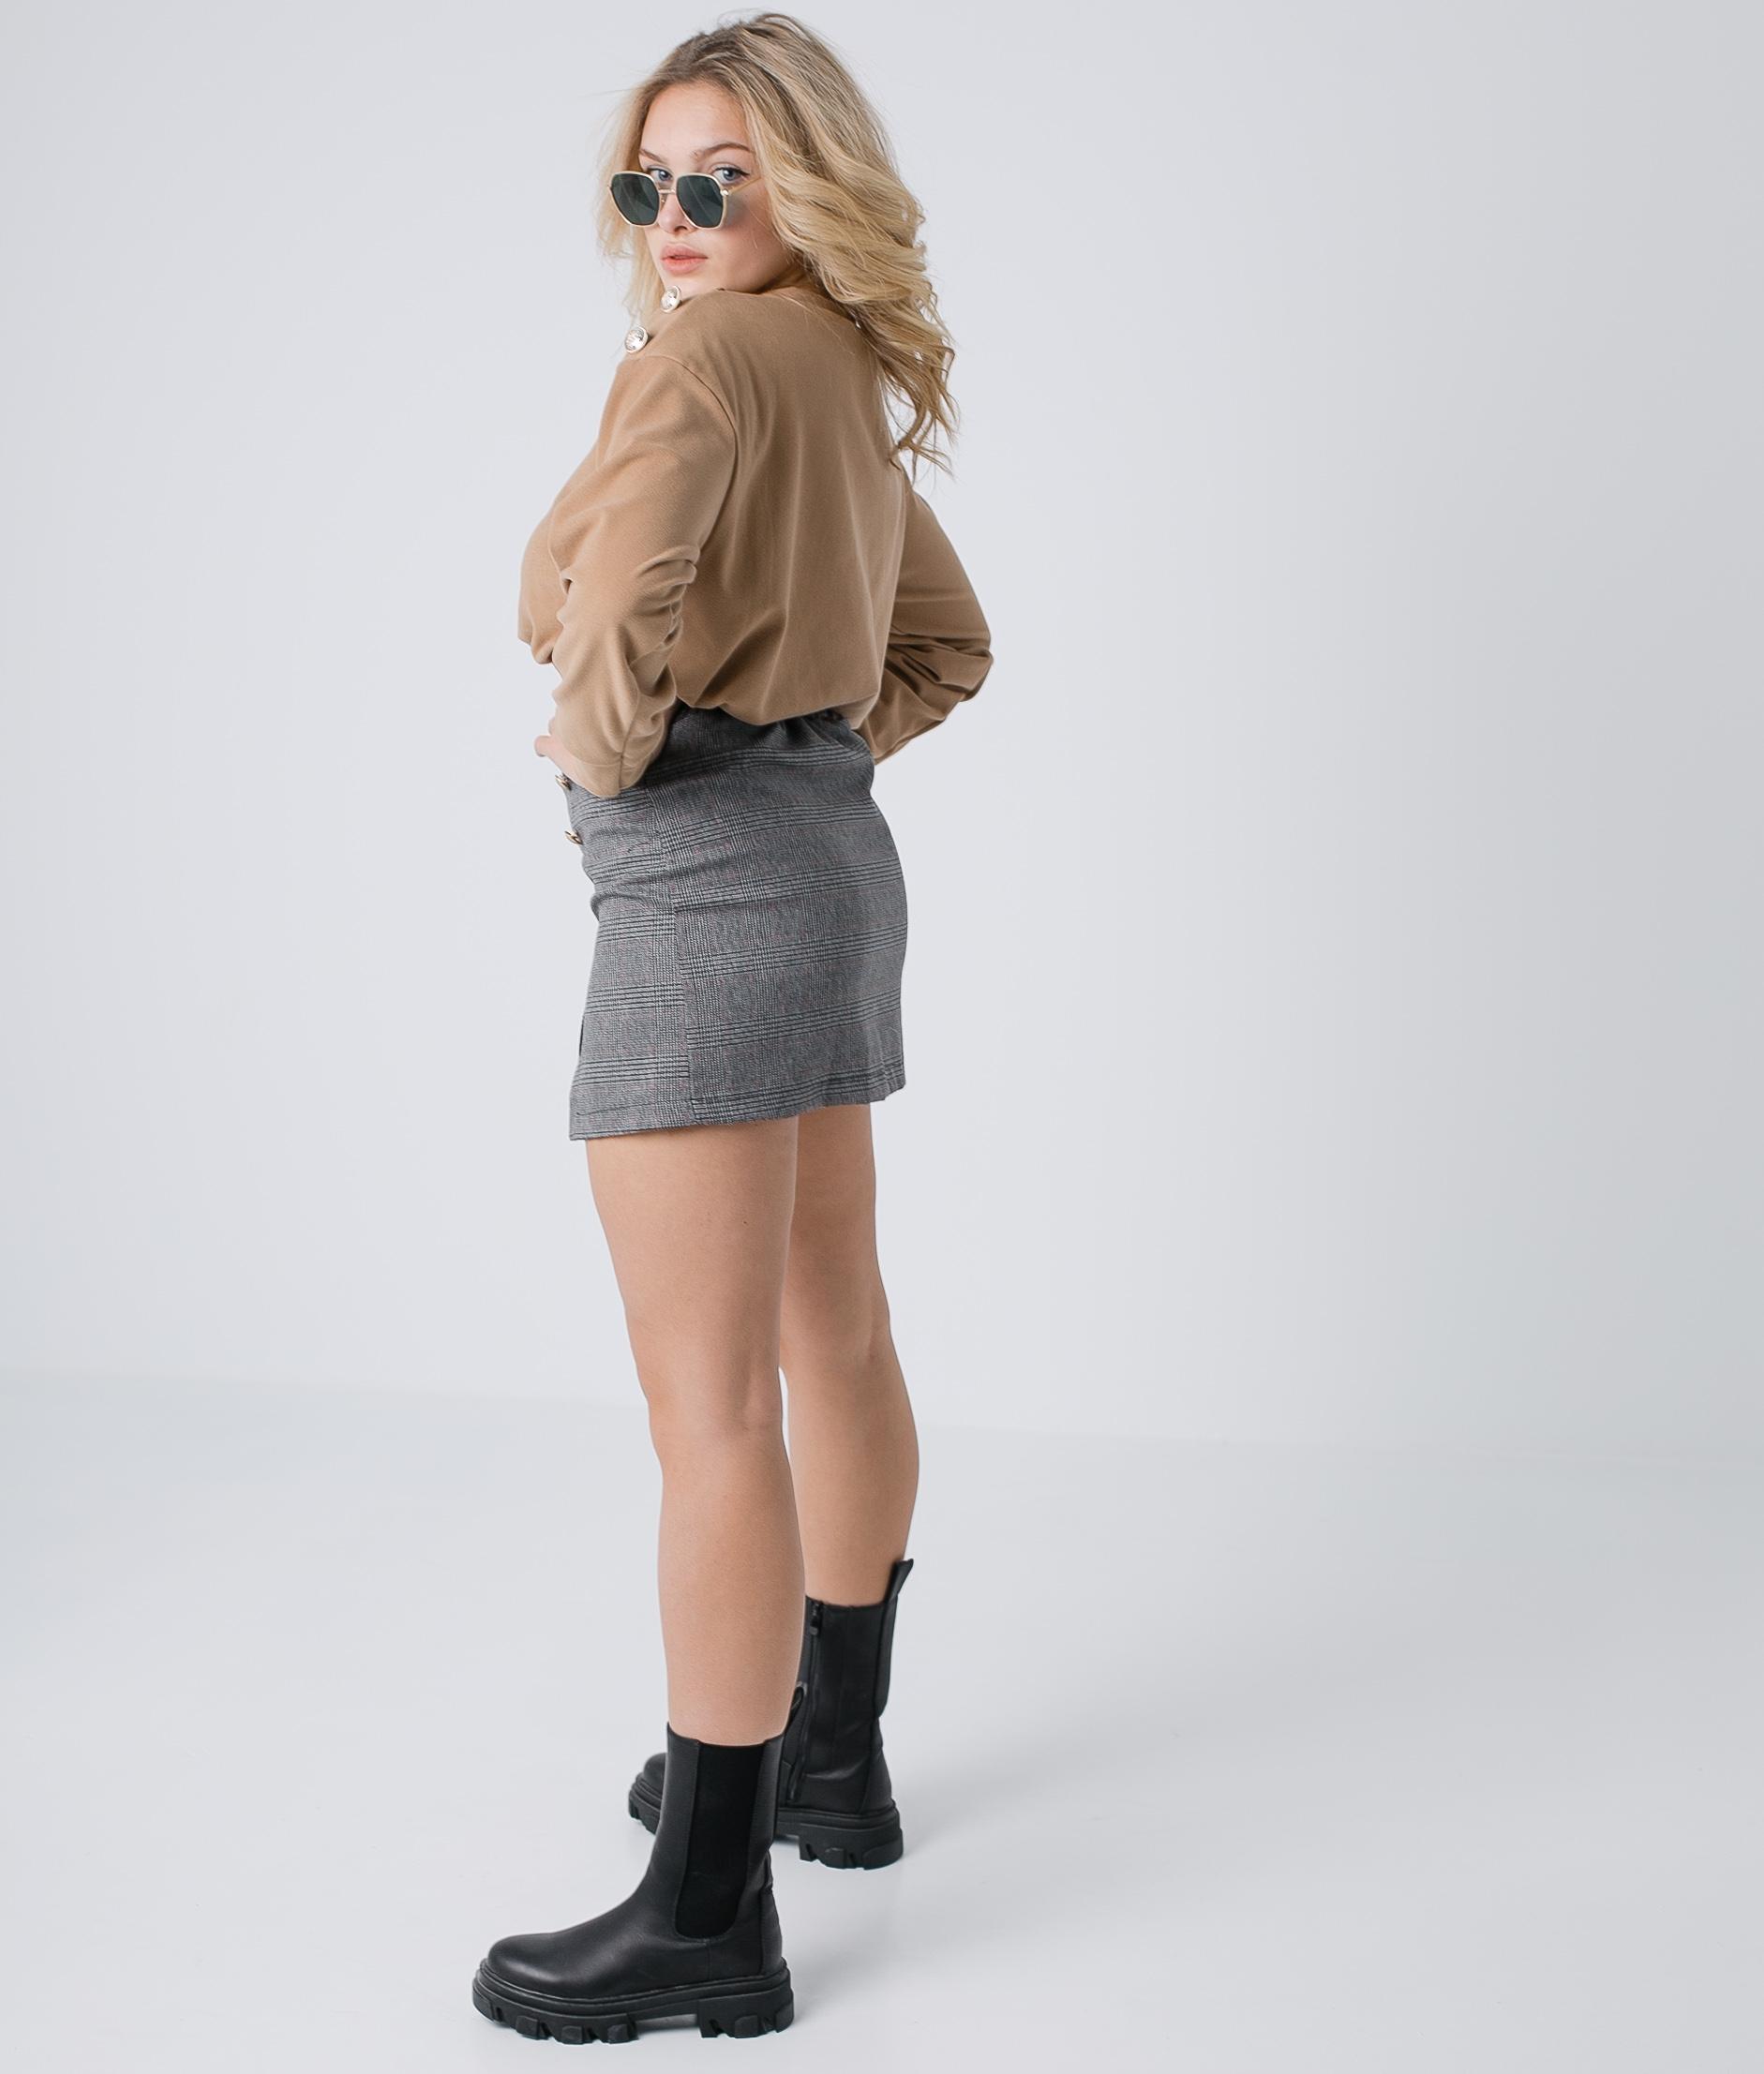 DENDRA SKIRT - GREY